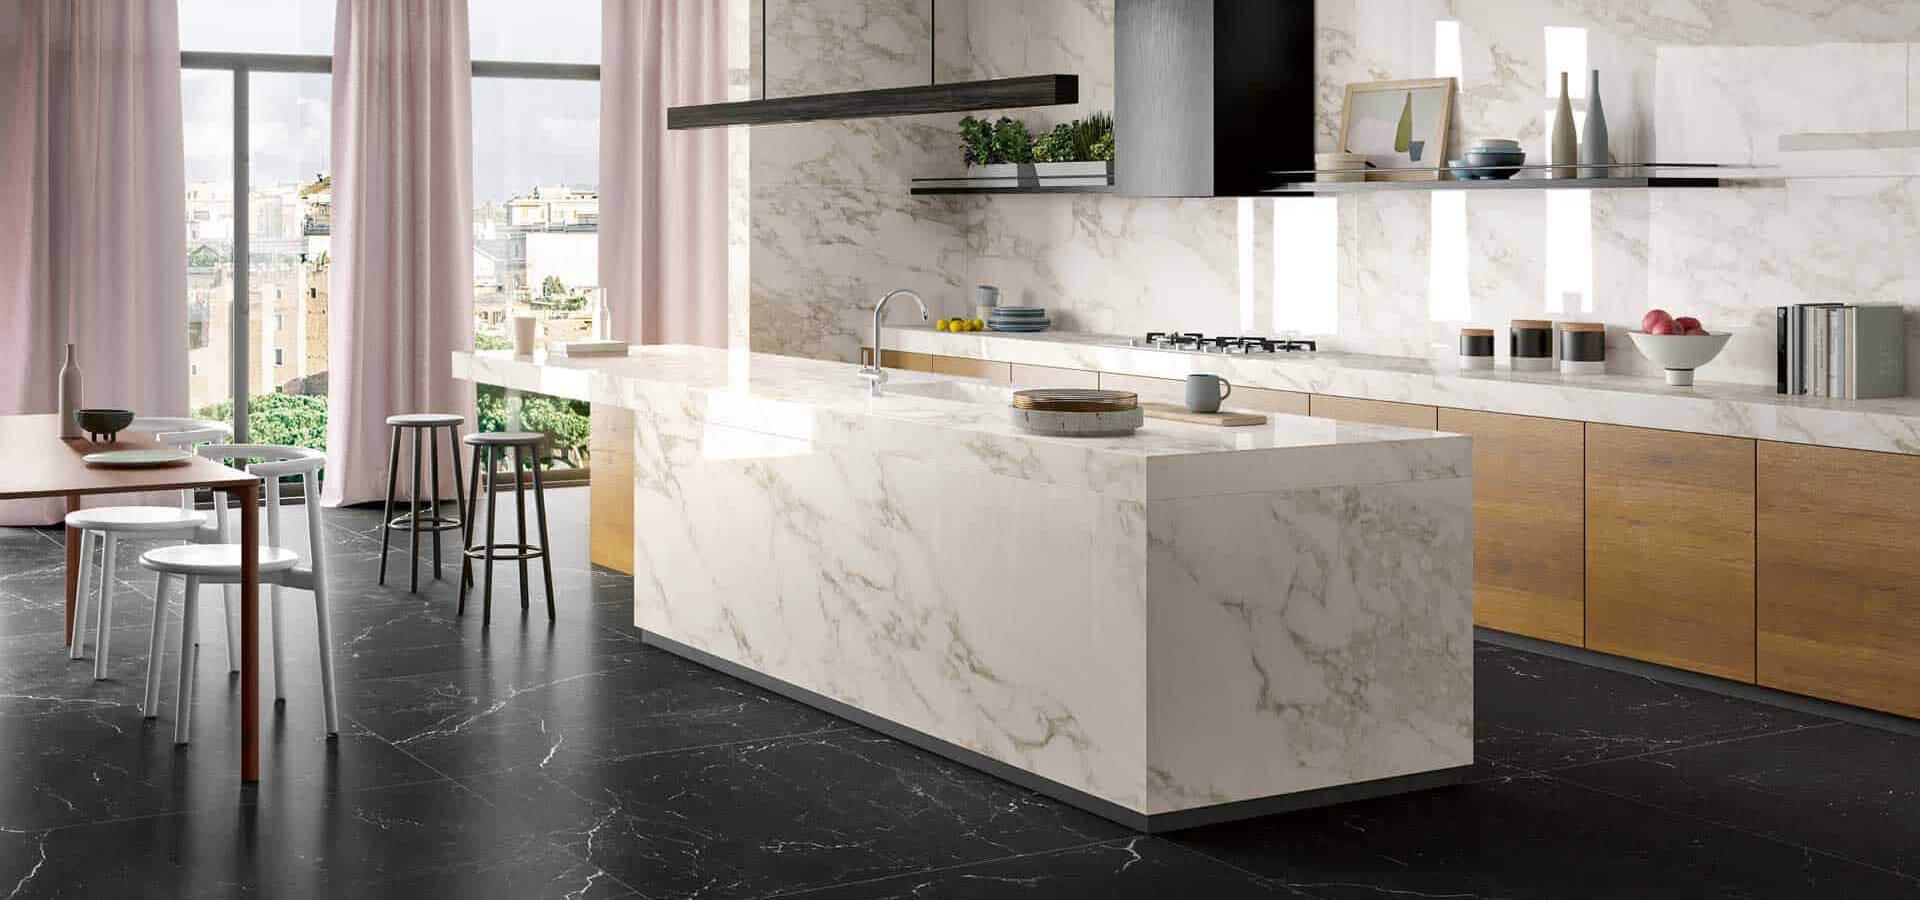 Cerbis Ceramics SA marble feature tiles